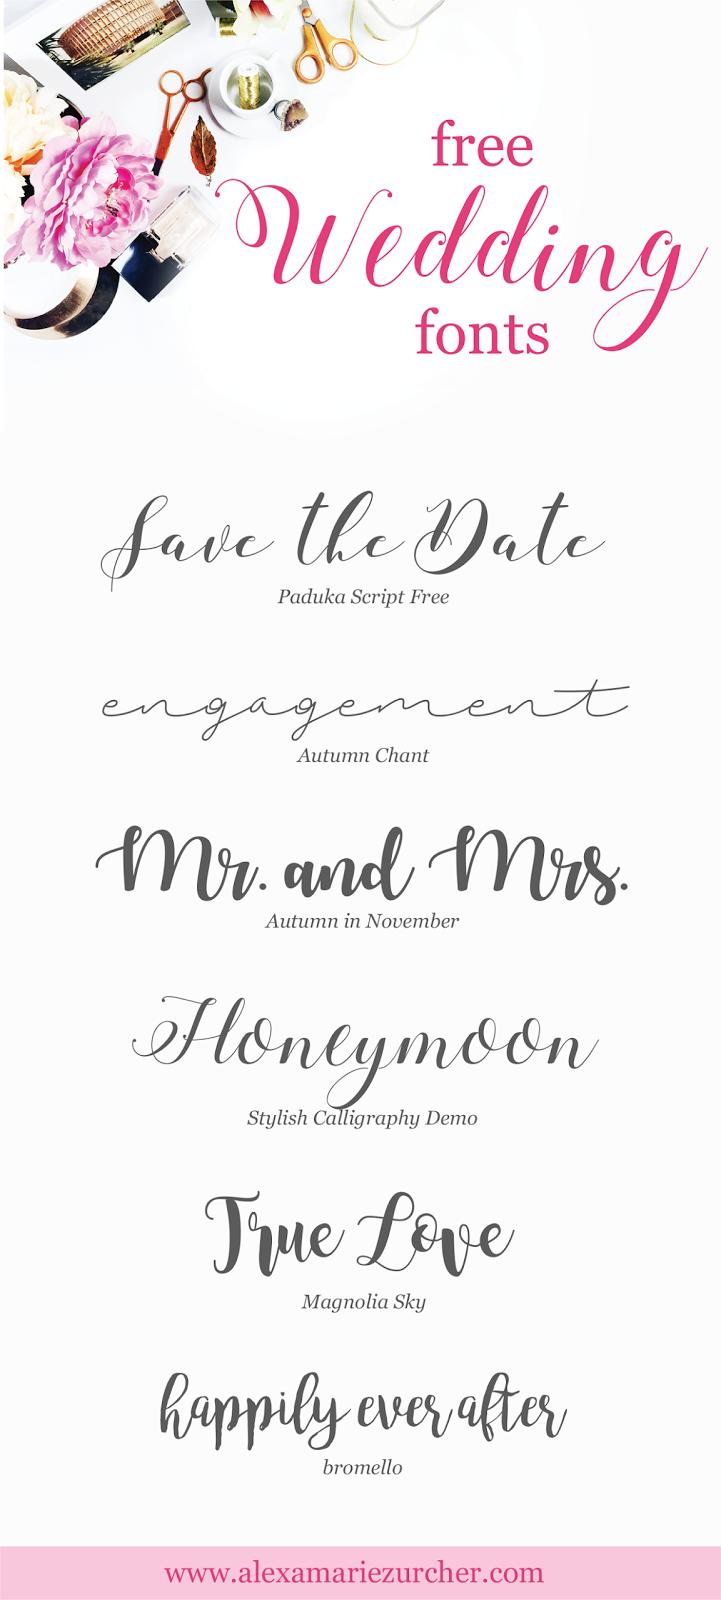 Wedding Scripts Fonts.Free Wedding Fonts Free Calligraphy Fonts Free Script